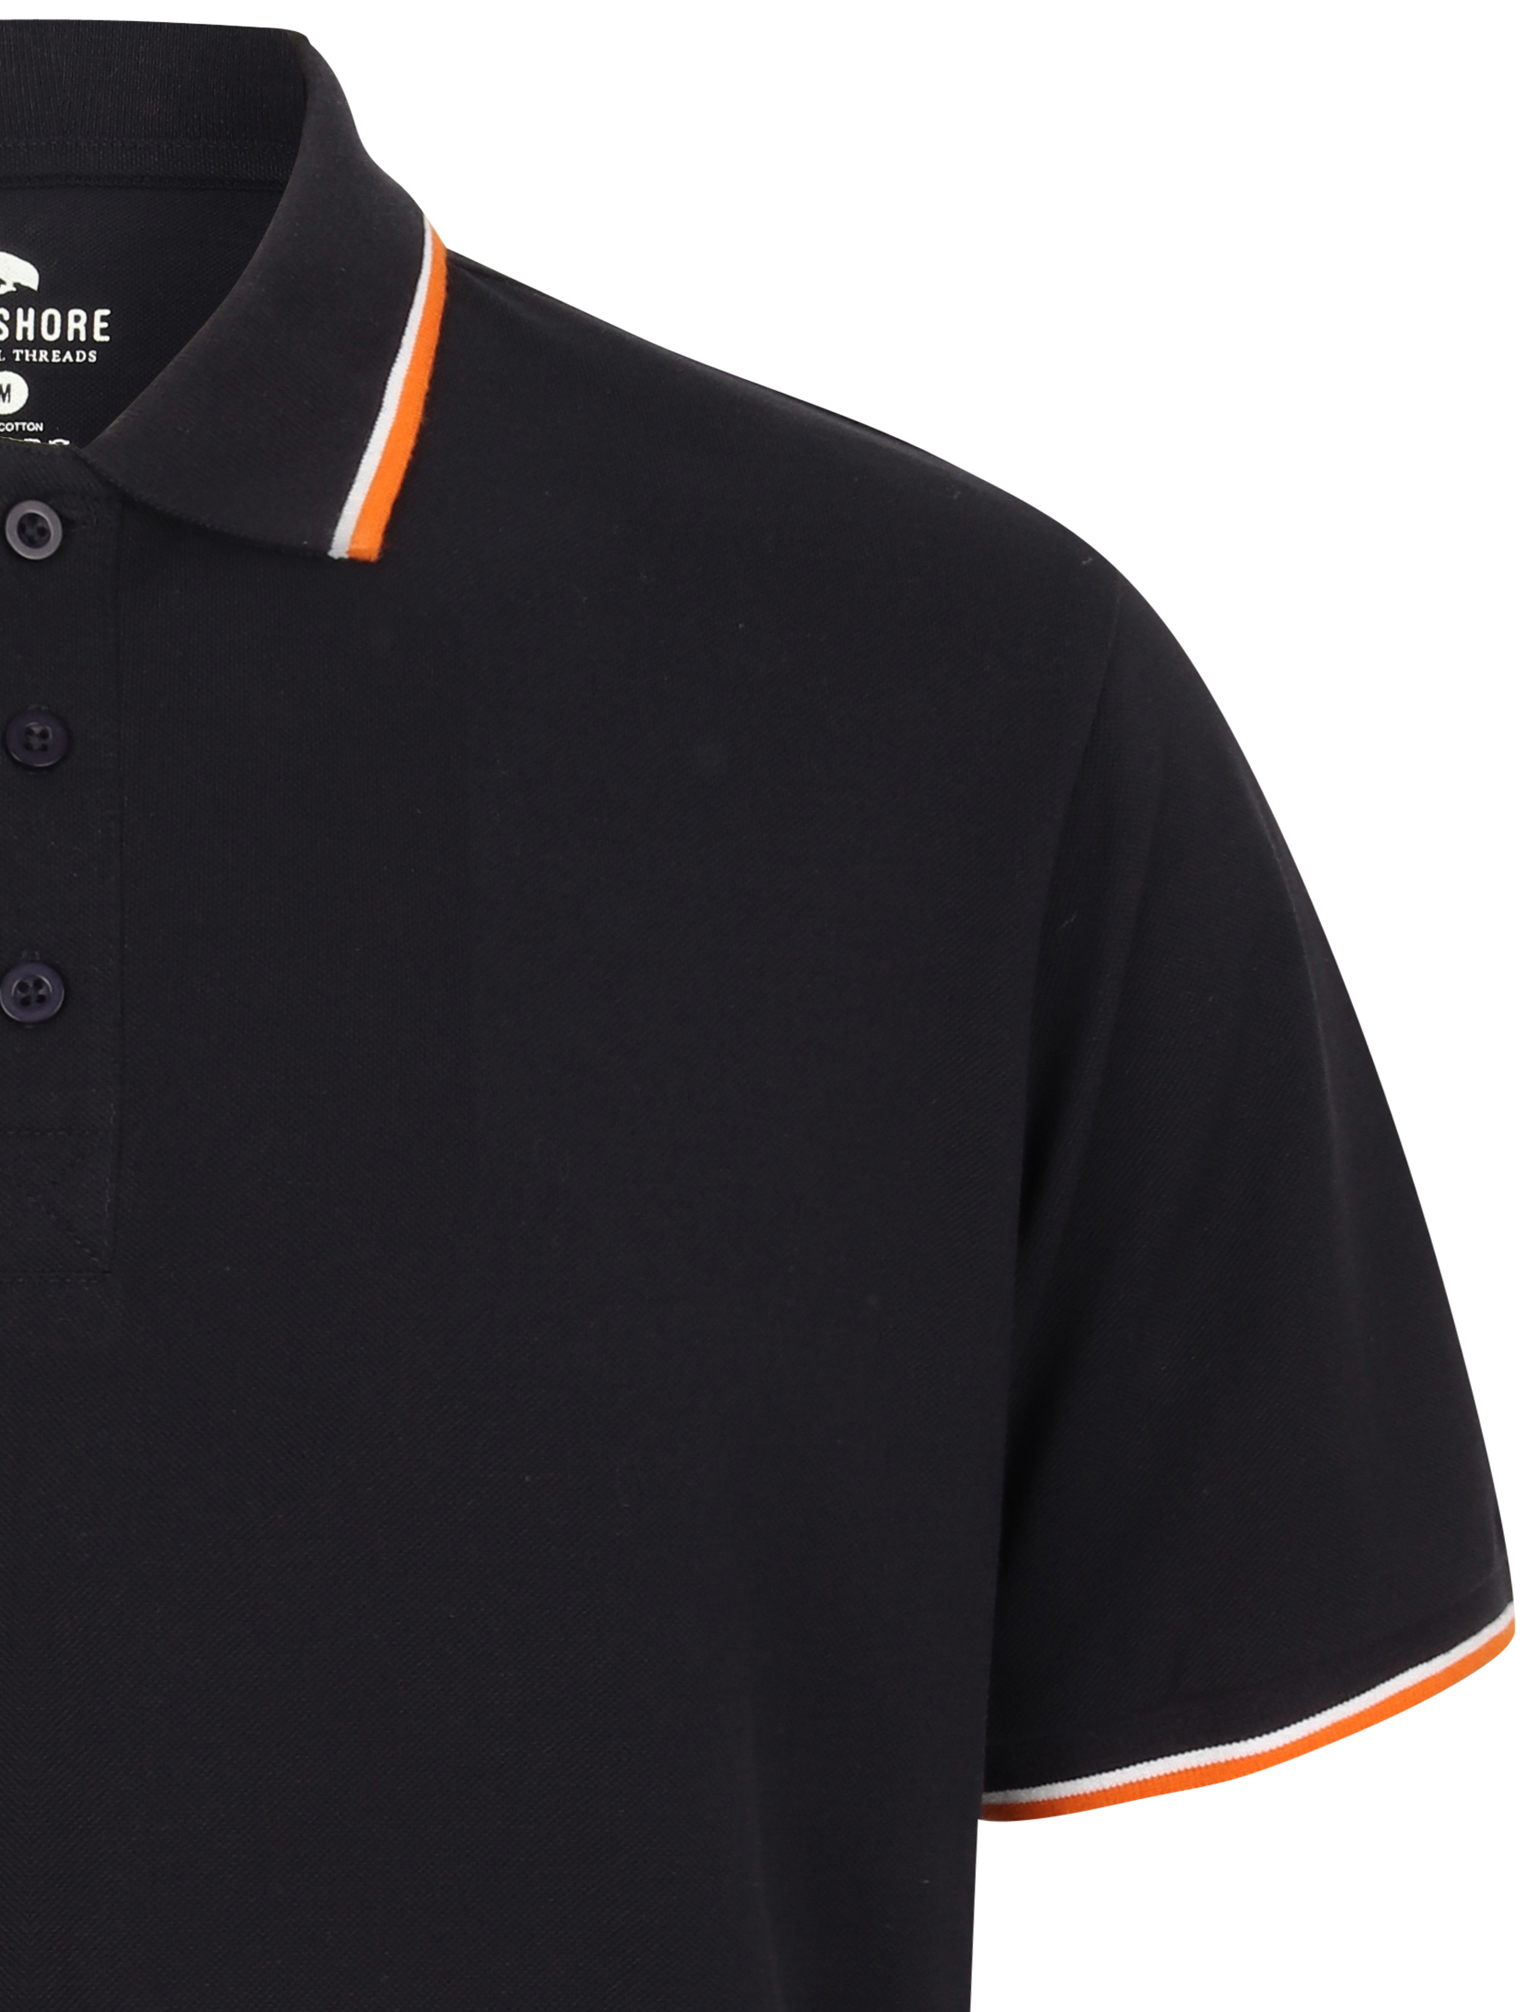 Sth-Shore-Mens-Plain-Polo-Shirt-100-Pique-Cotton-T-Shirt-Top-Collar-Size-M-XXL thumbnail 5